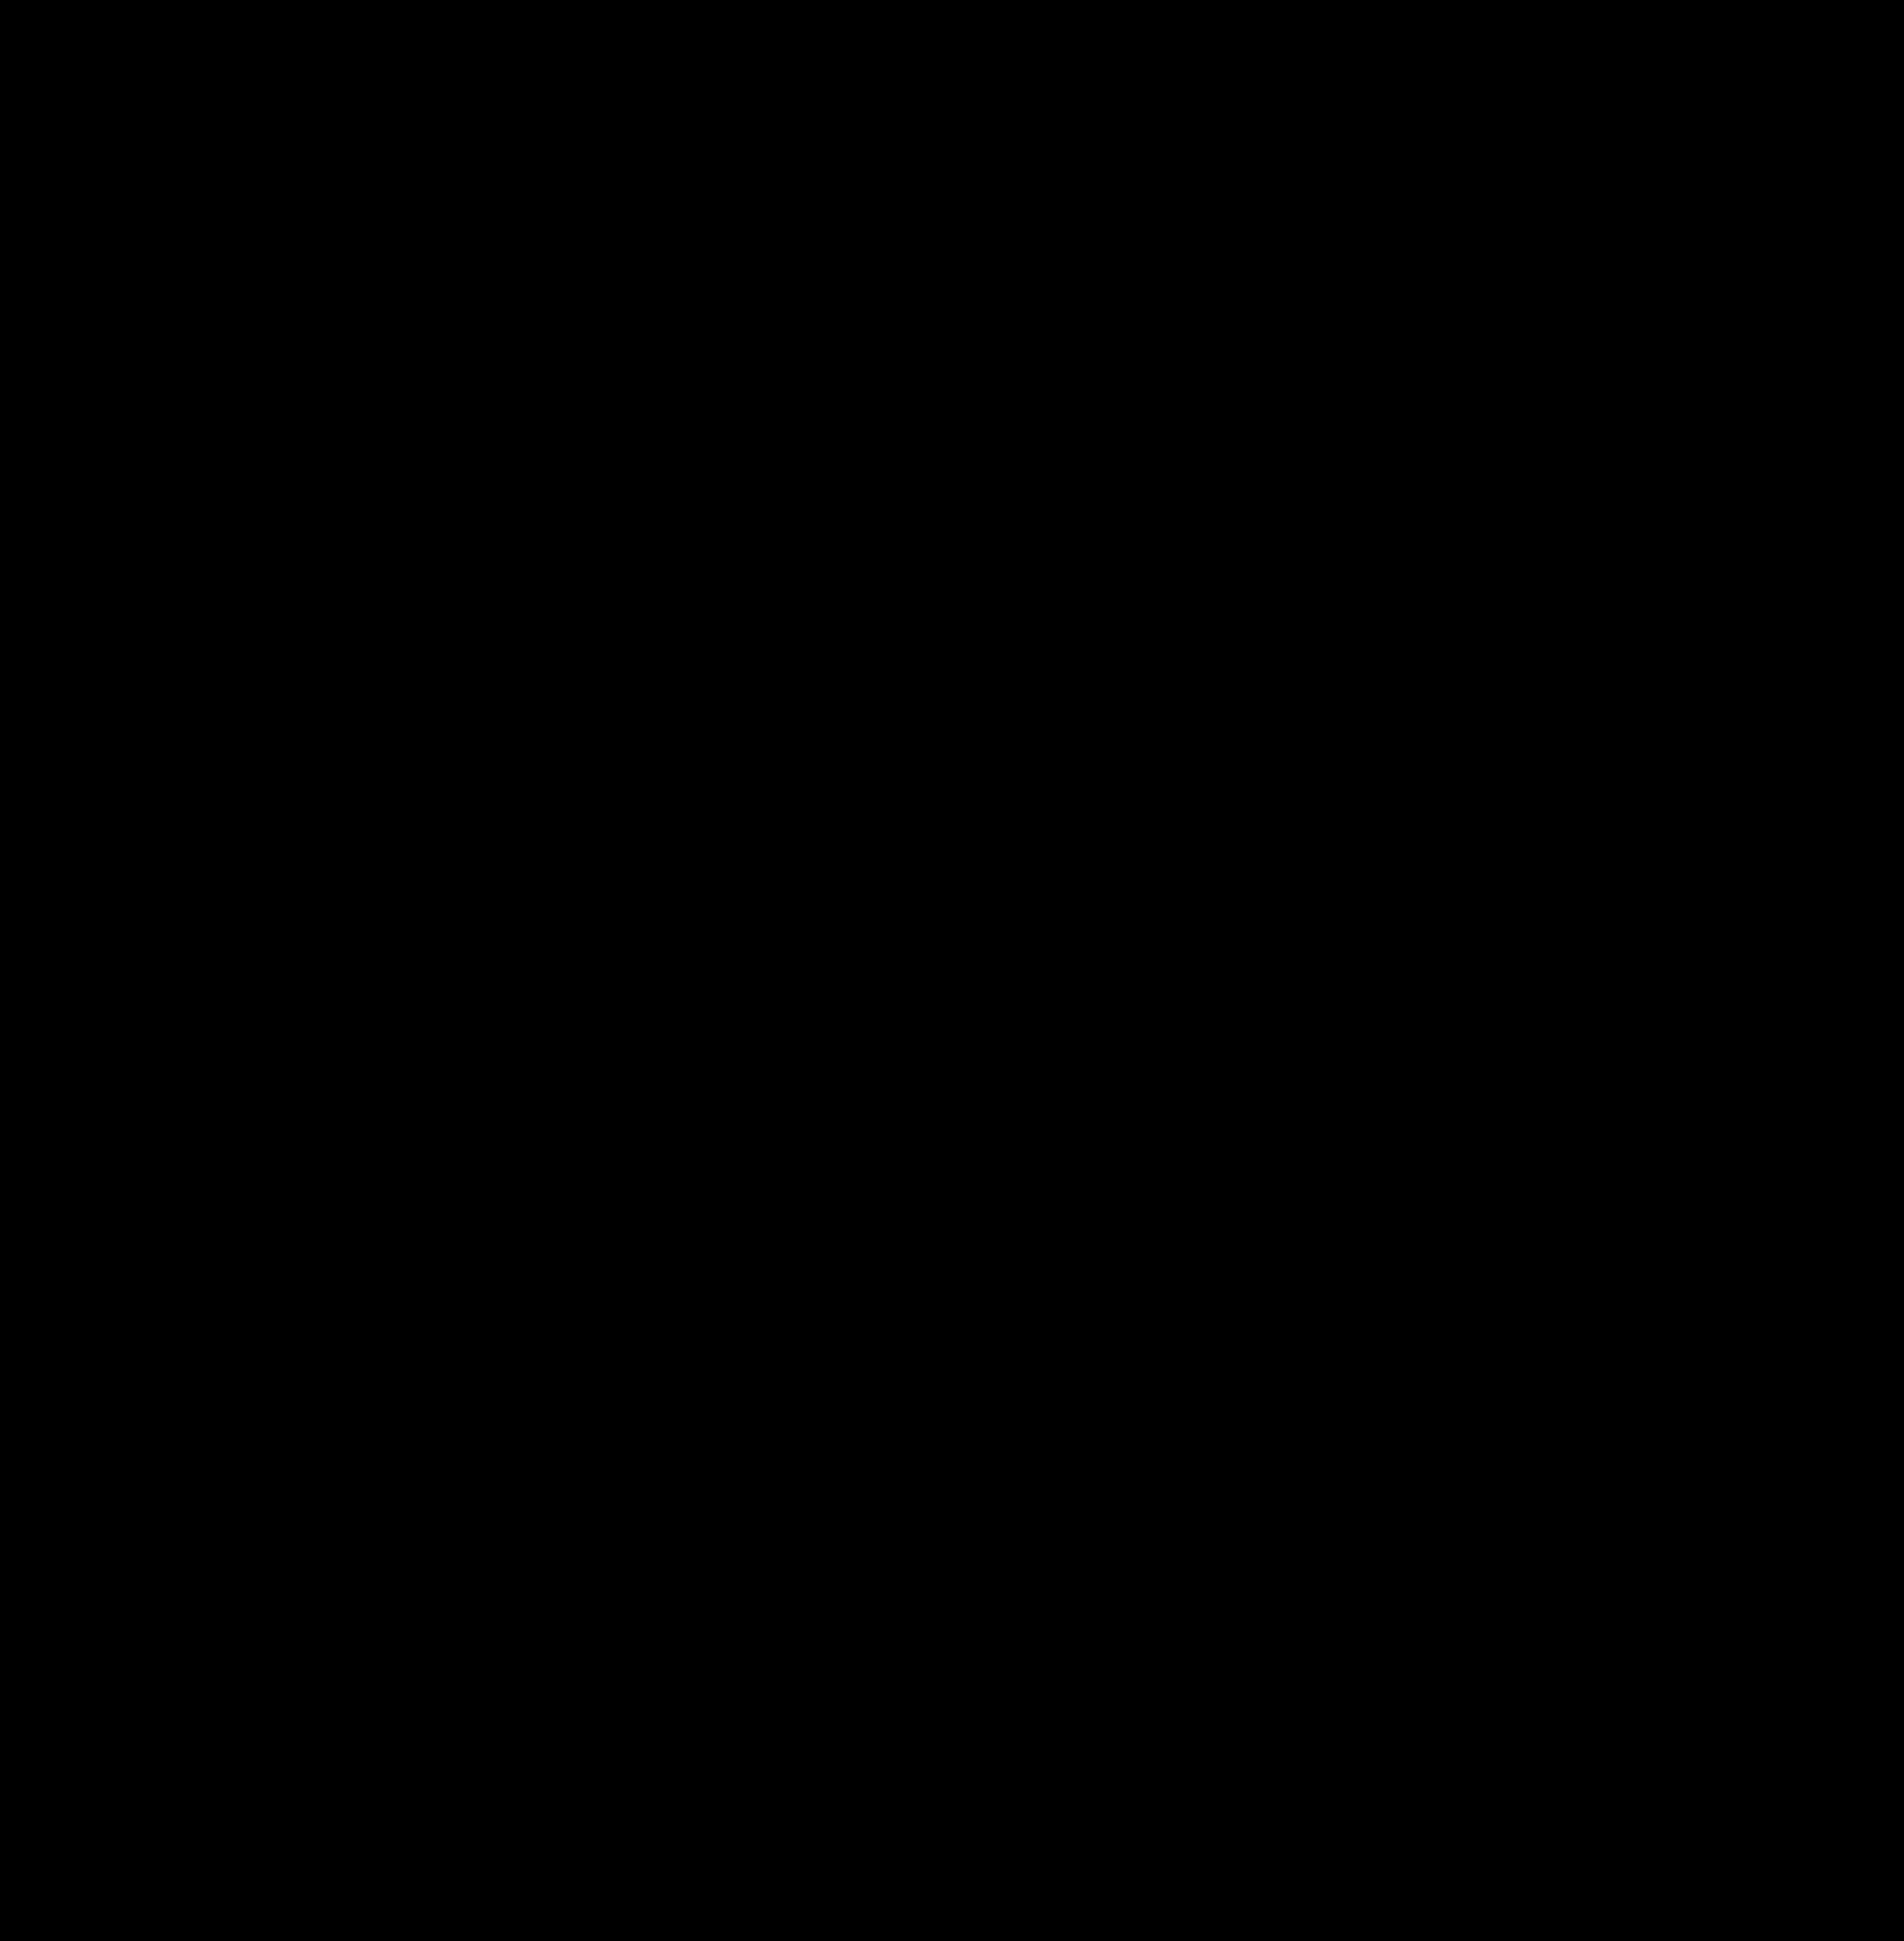 Bil - Verksted-logo-black.png